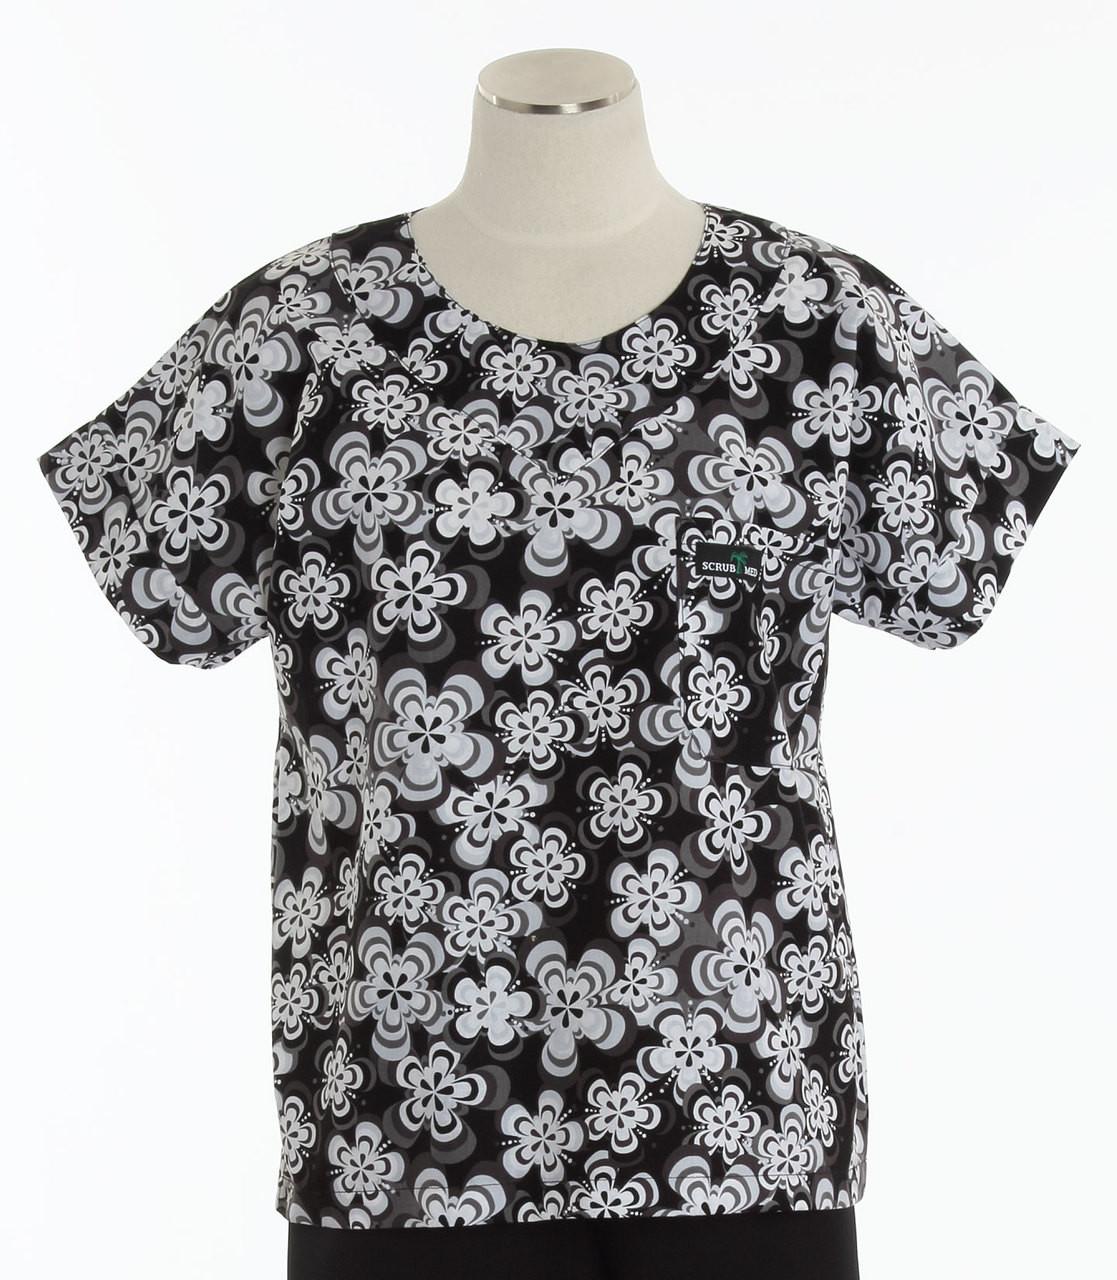 b102d164bde Scrub Med Womens Print Scrub Top Hypnotic - Original Price: $31.00 ...